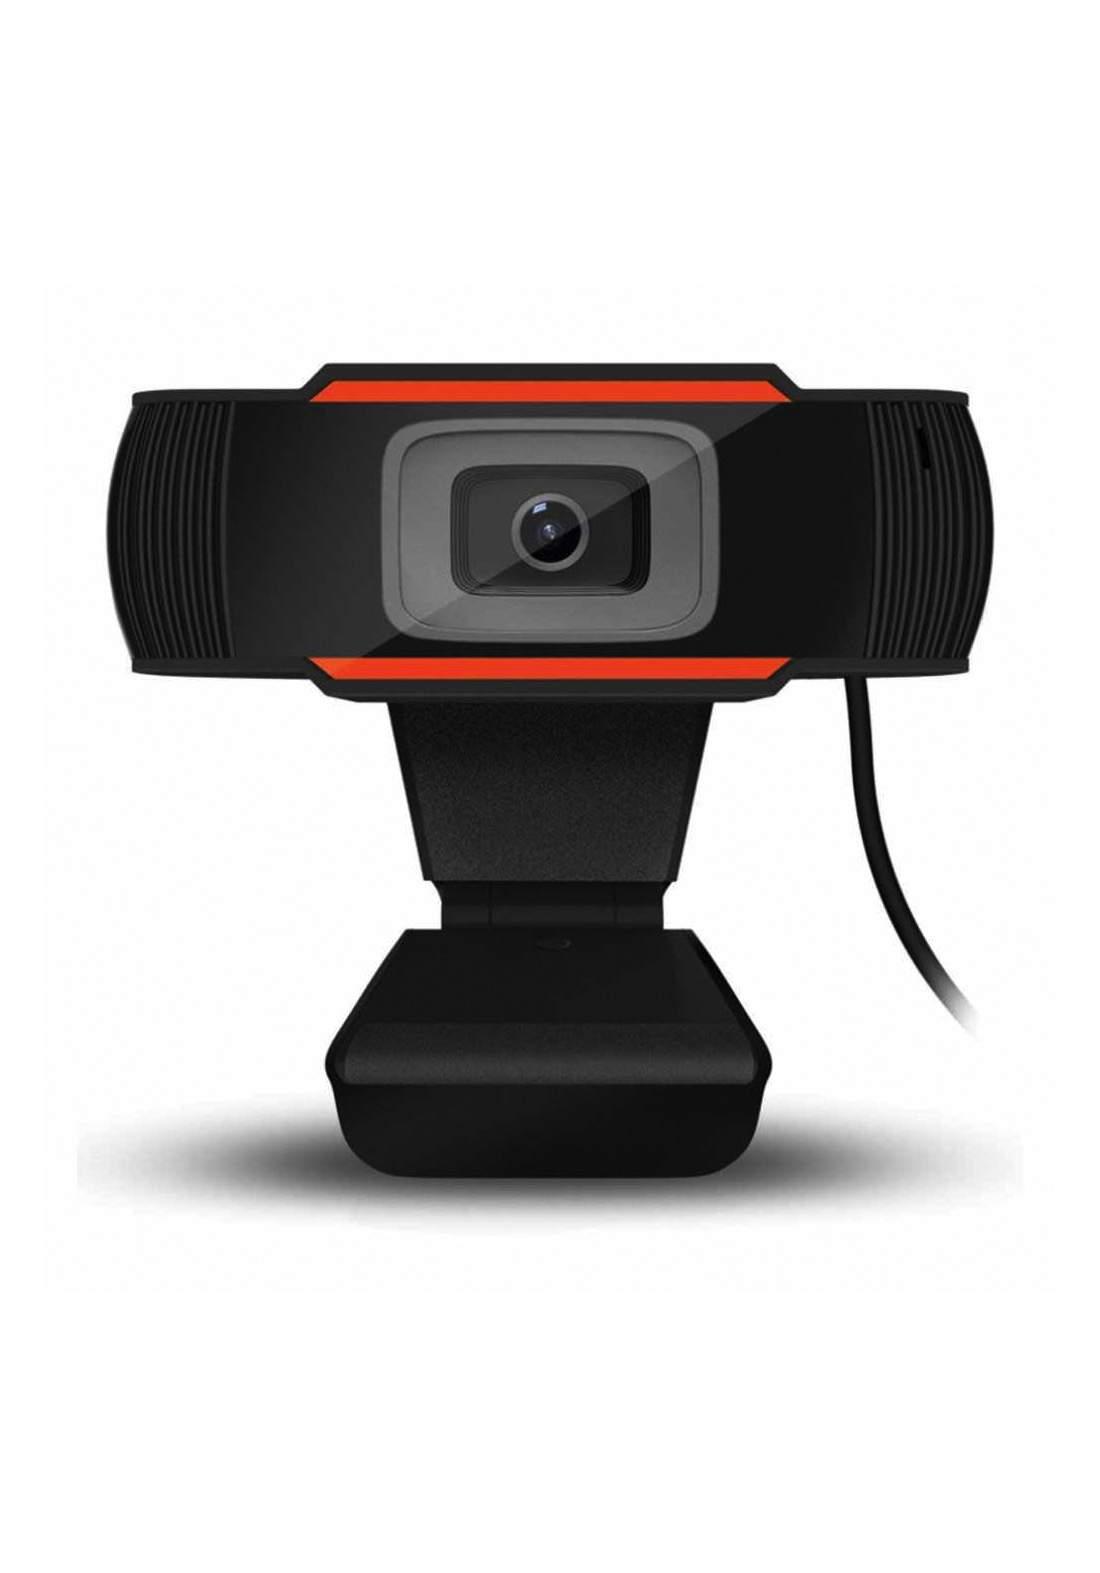 Microcase WC201C Webcam Hd 720p Usb Microphone Video Zoom - Black كاميرا ويب